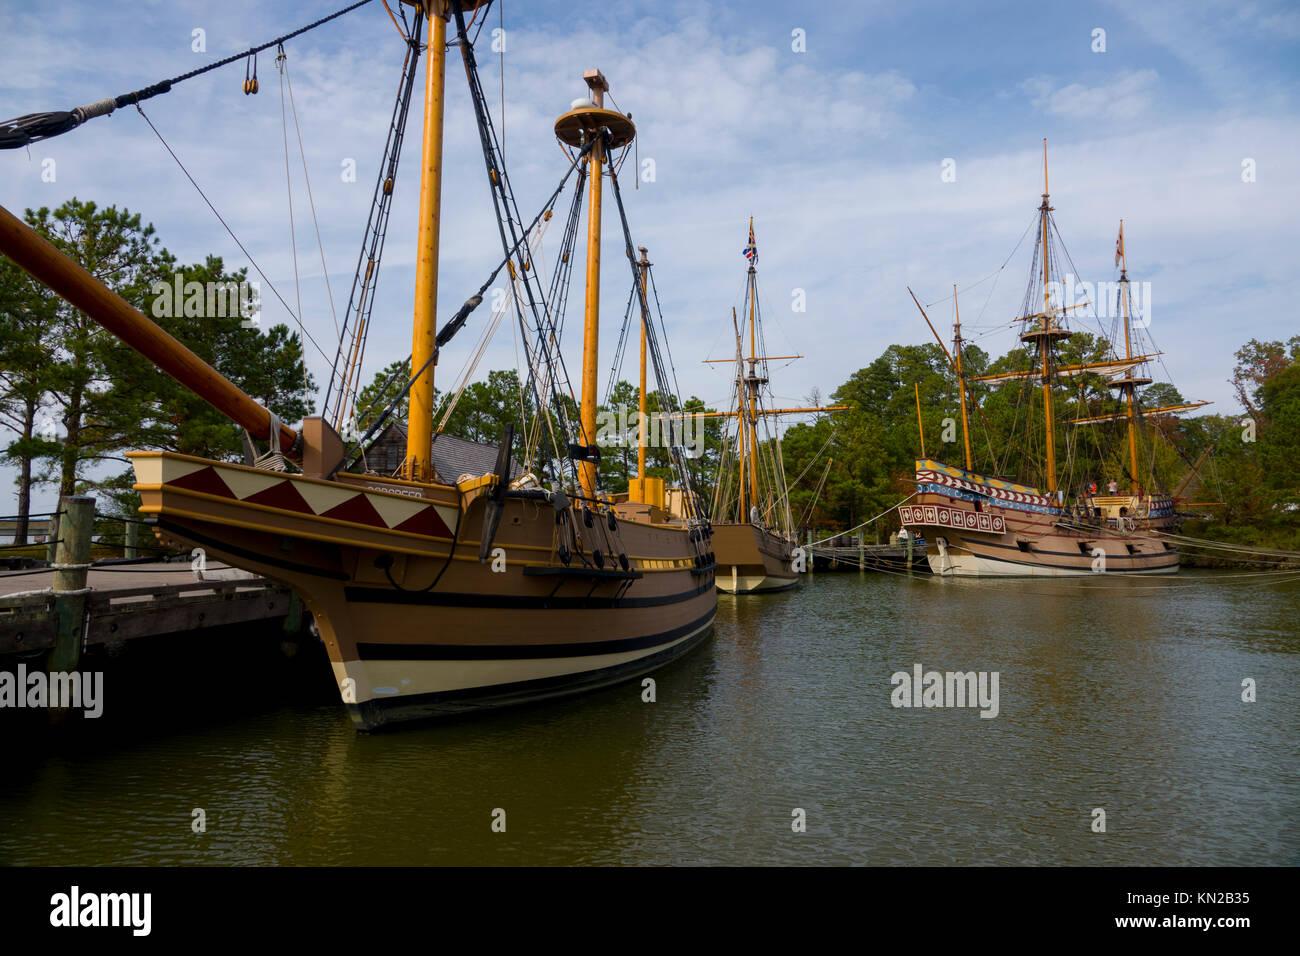 usa-virginia-va-historic-jamestown-settlement-three-ships-susan-constant-KN2B35.jpg